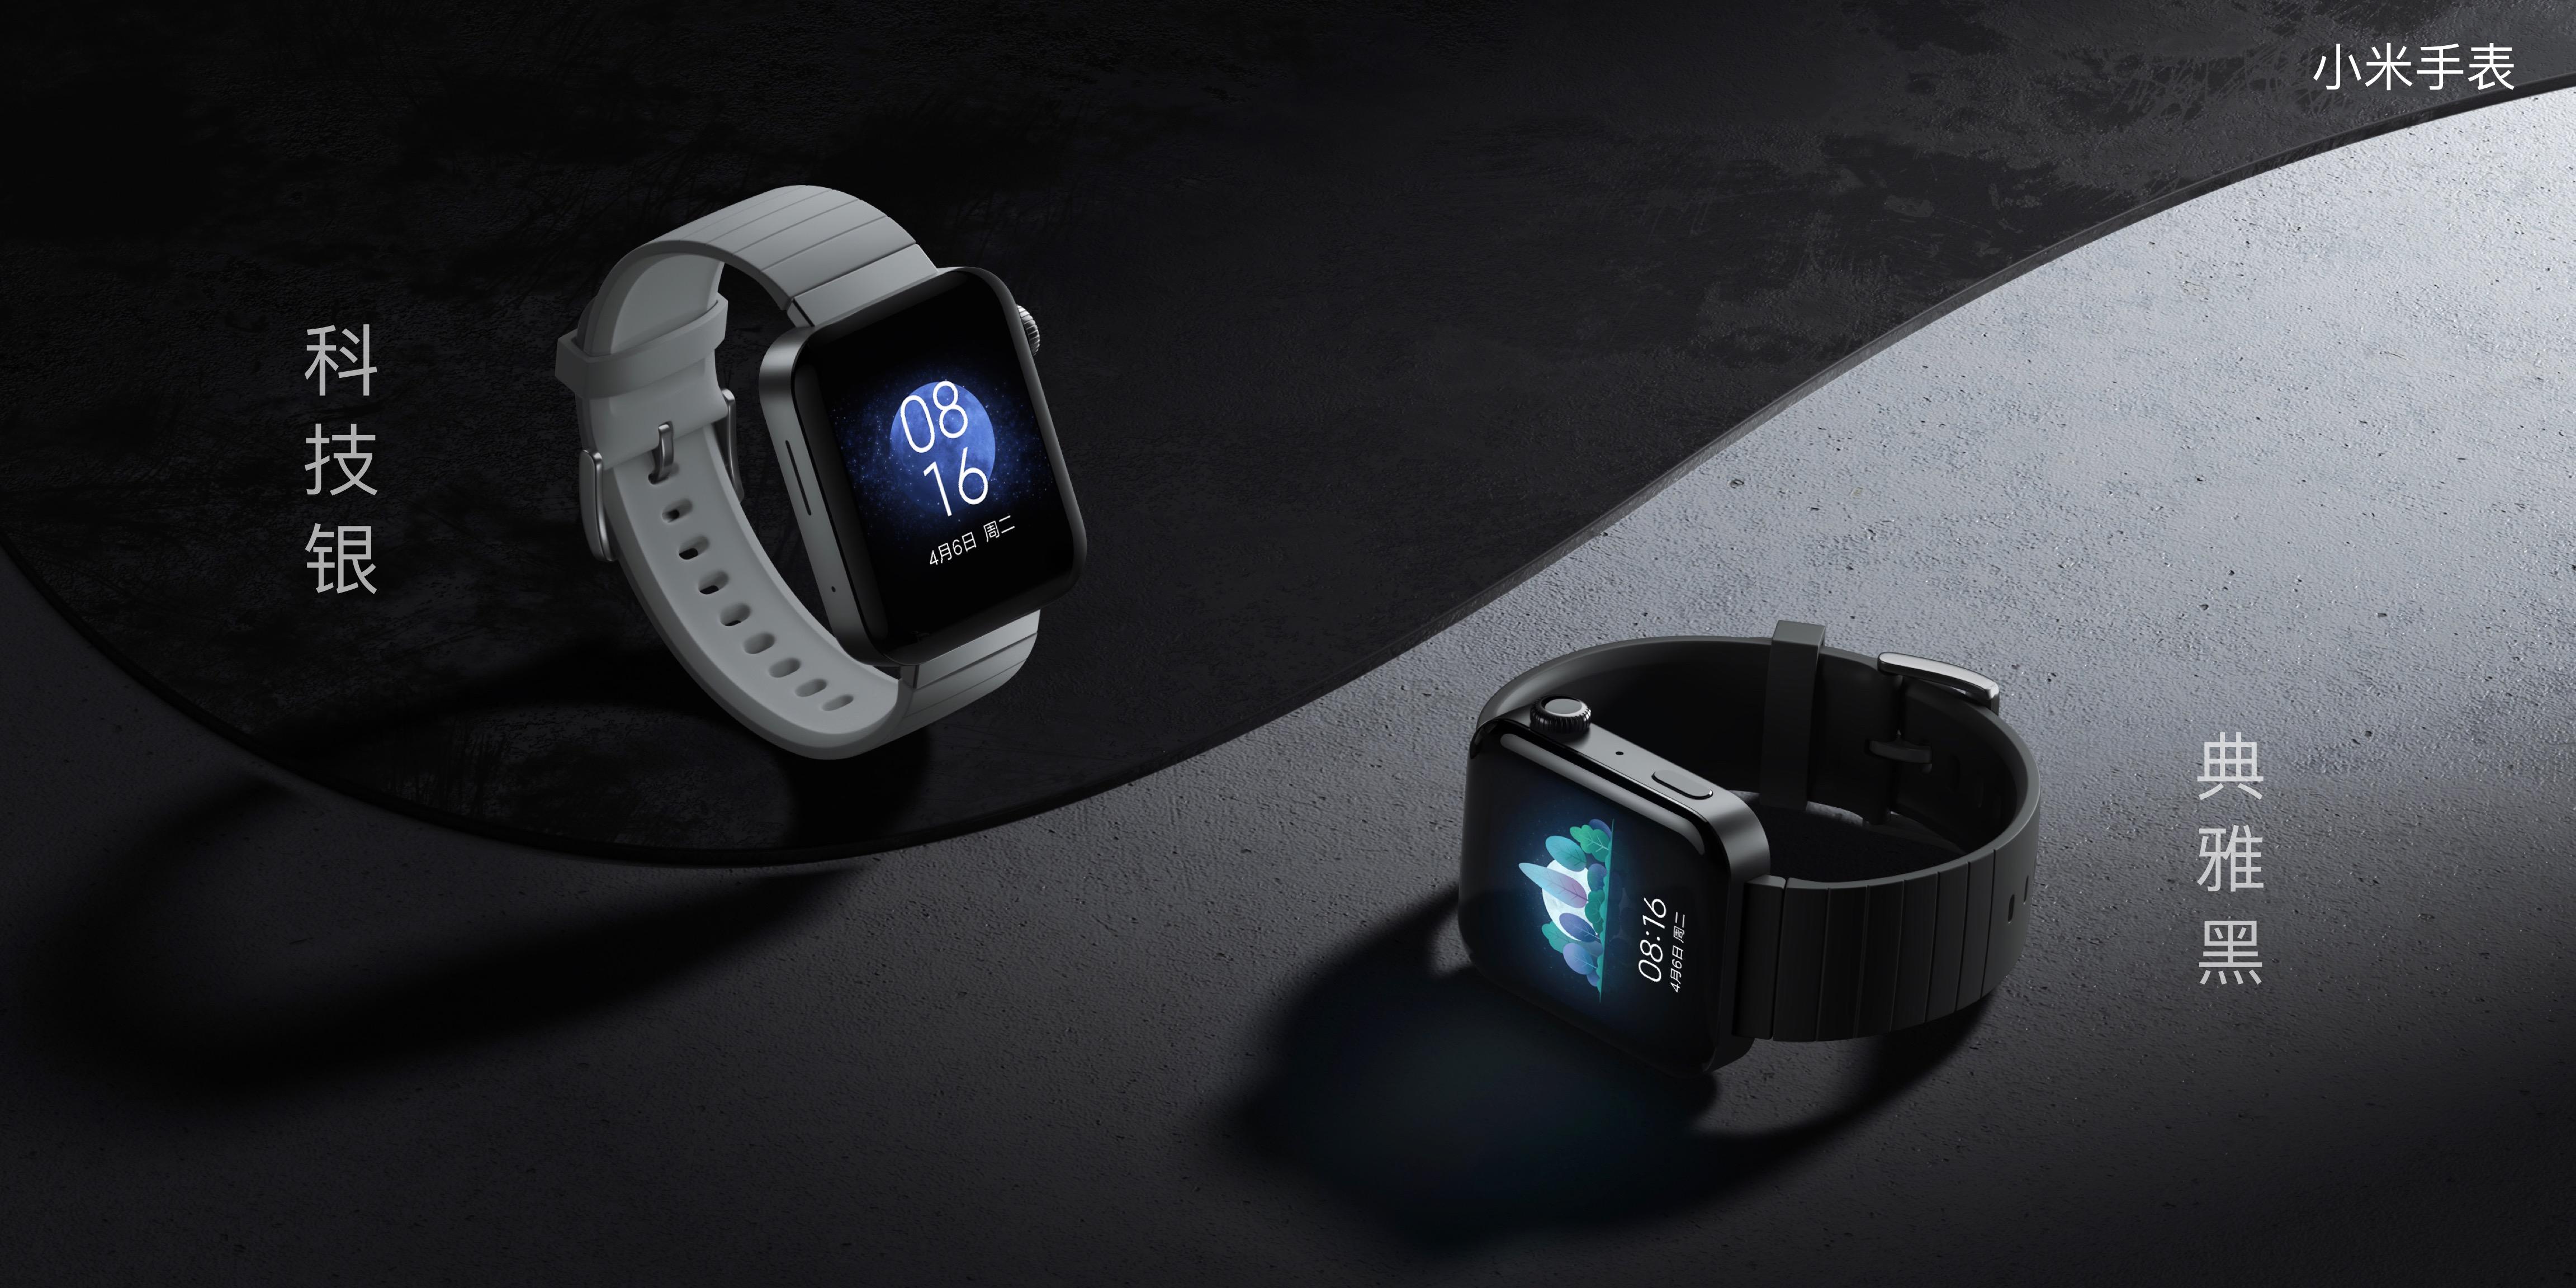 Xiaomi Mi Watch, vlastnosti, špecifikácie, cena-dátum vydania. Xiaomi Addicted News